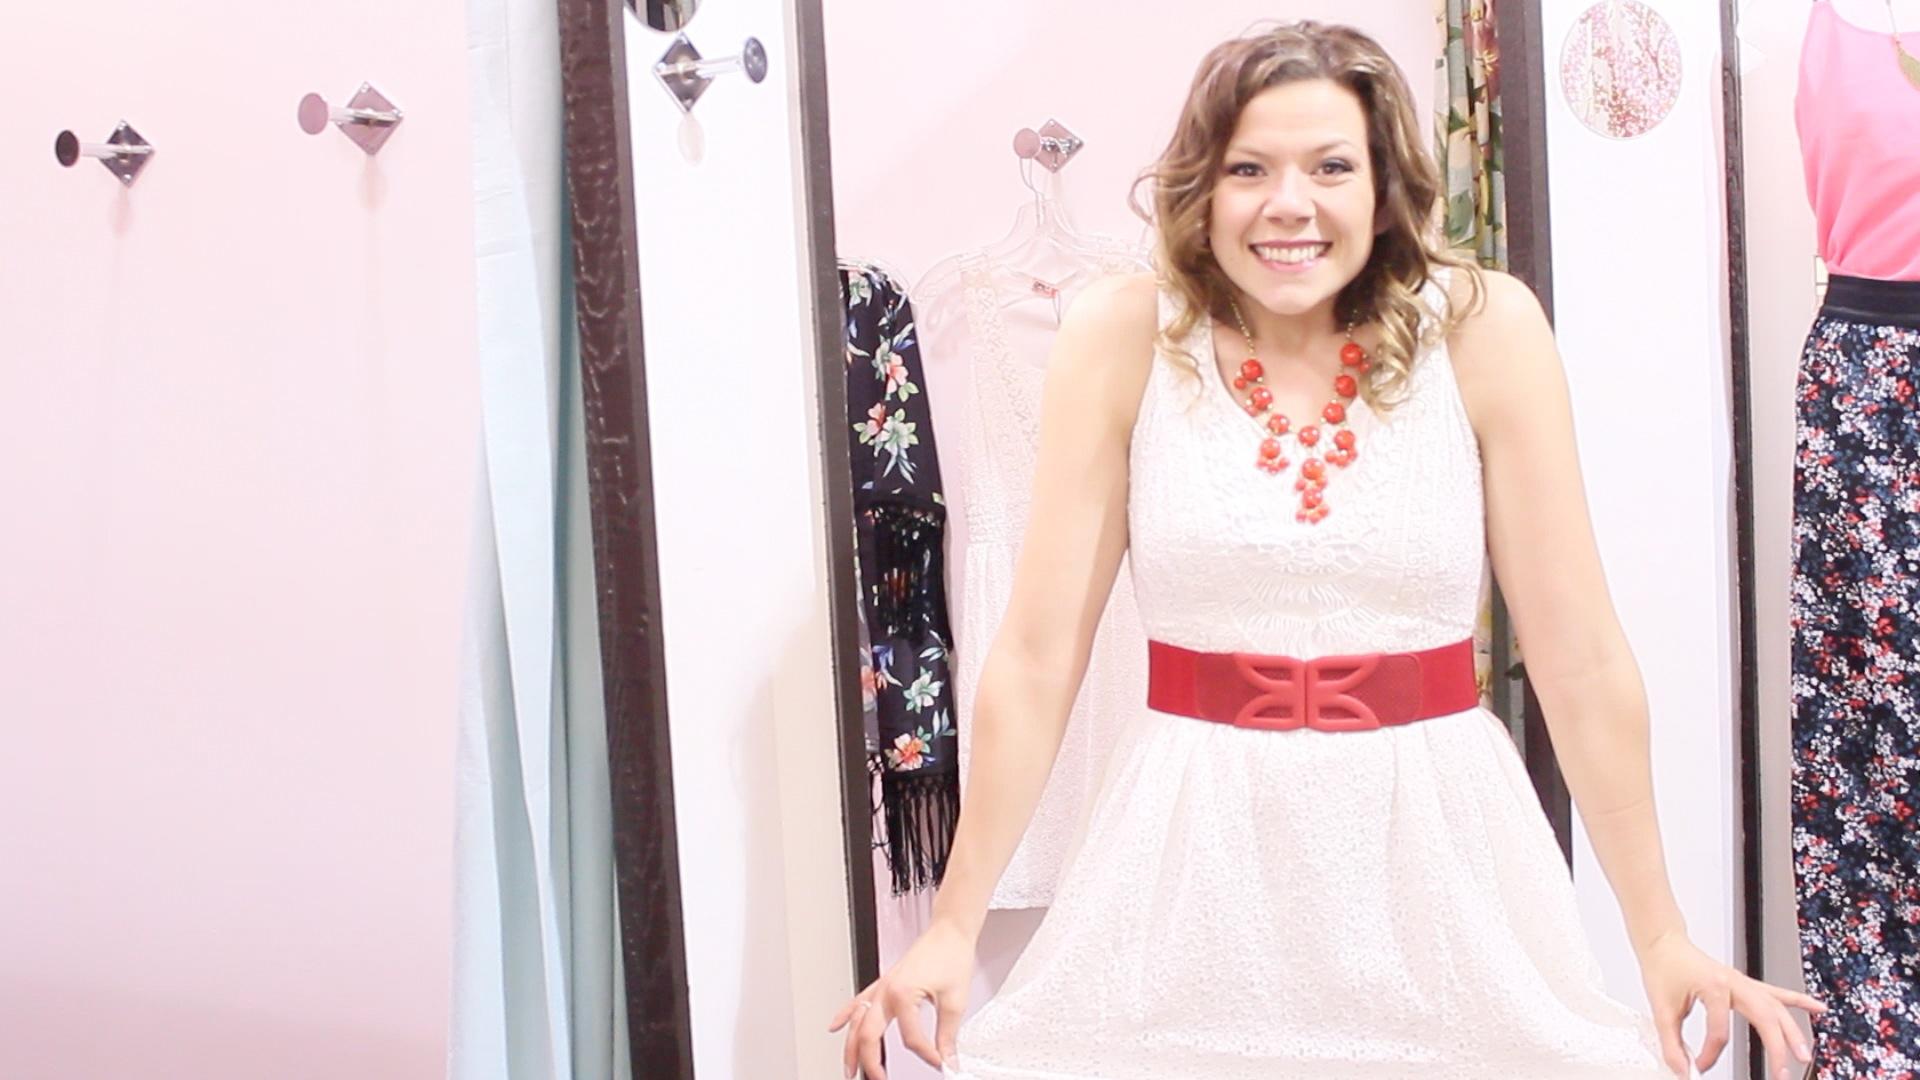 Alexis trying on a Farminista dress  Photo: Emilie Lebel